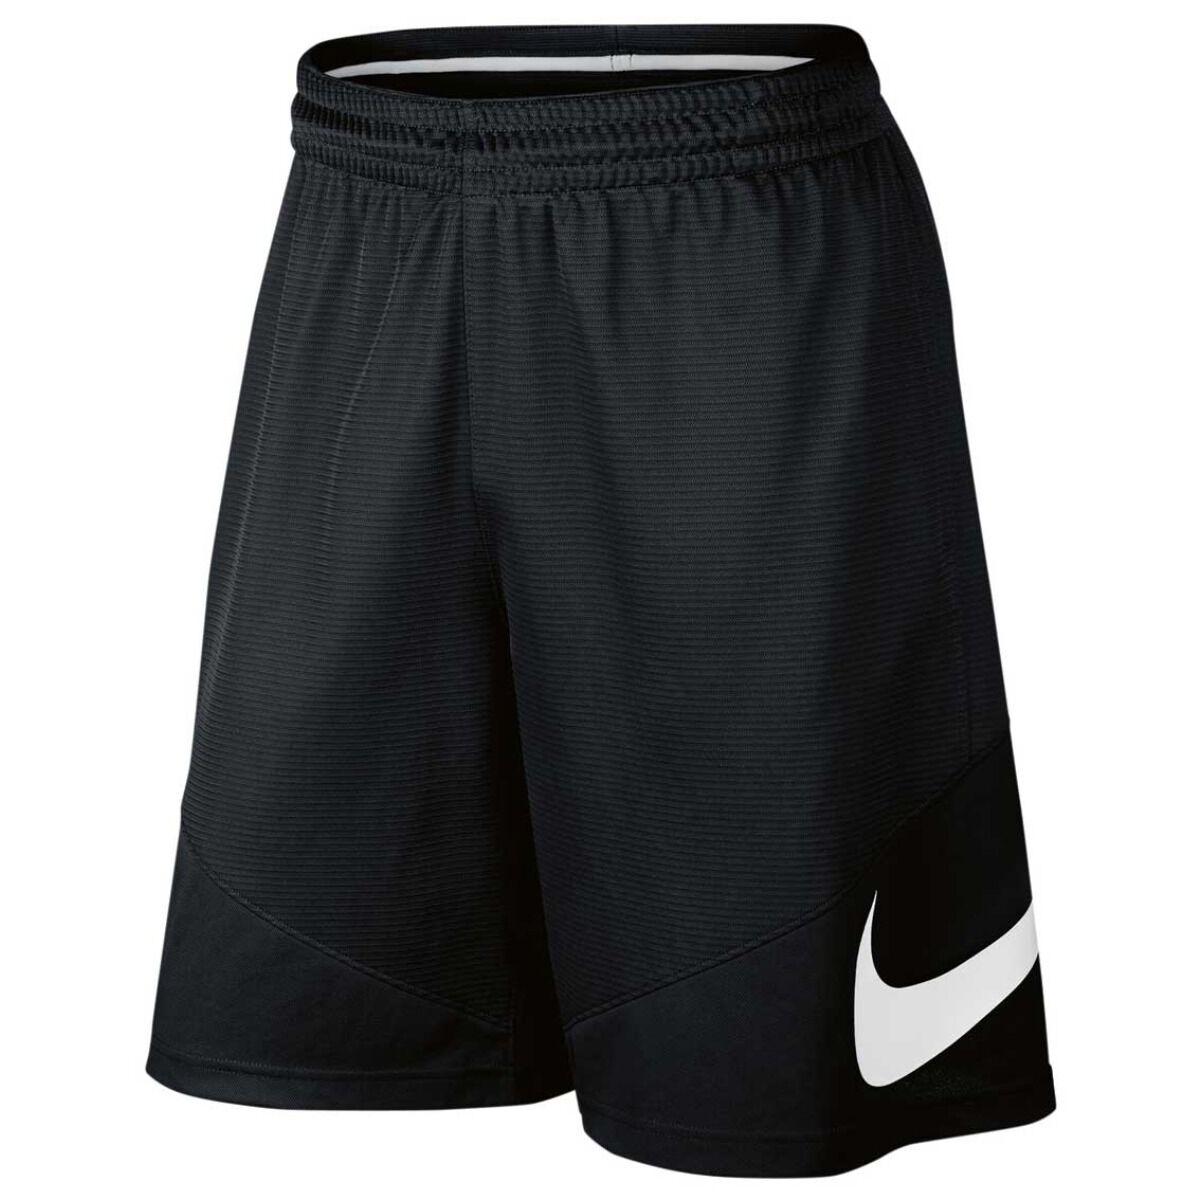 5babb8ccc0 Nike mens basketball shorts black white adults black white rebel jpg  1000x1000 Grey and black basketball